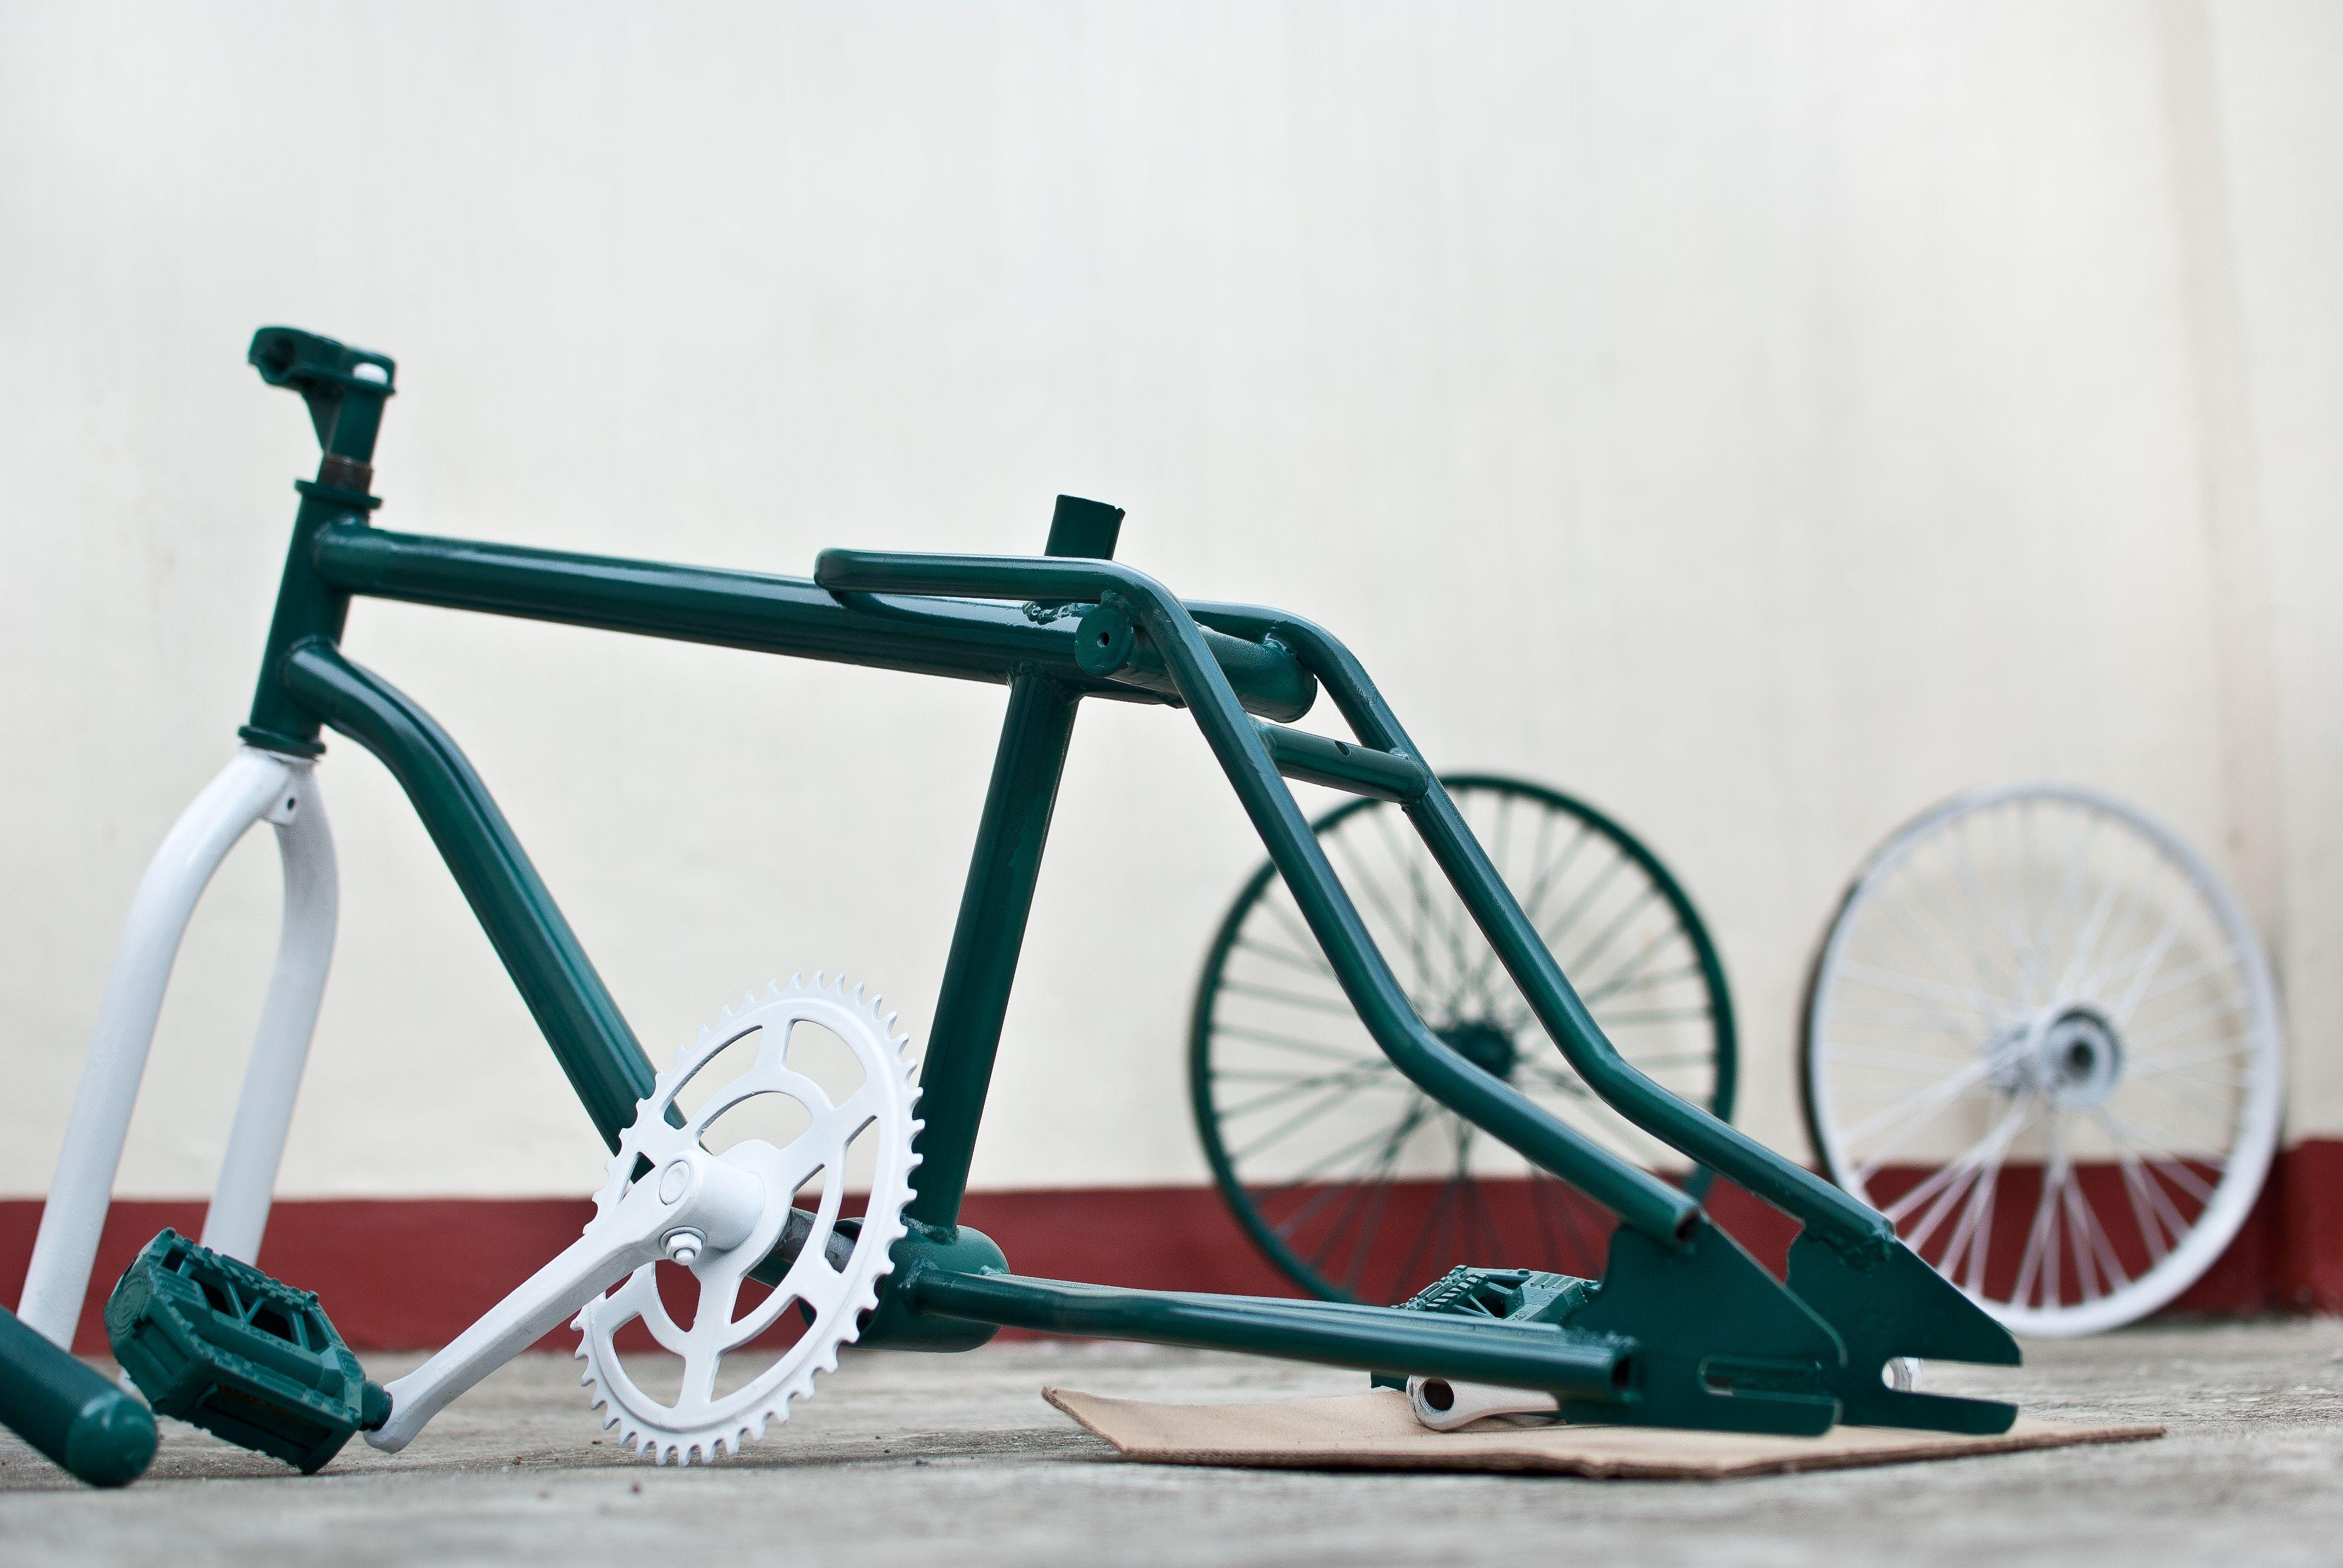 Paint a Bike | moms bike | Pinterest | Bike, Bicycle and Paint bike